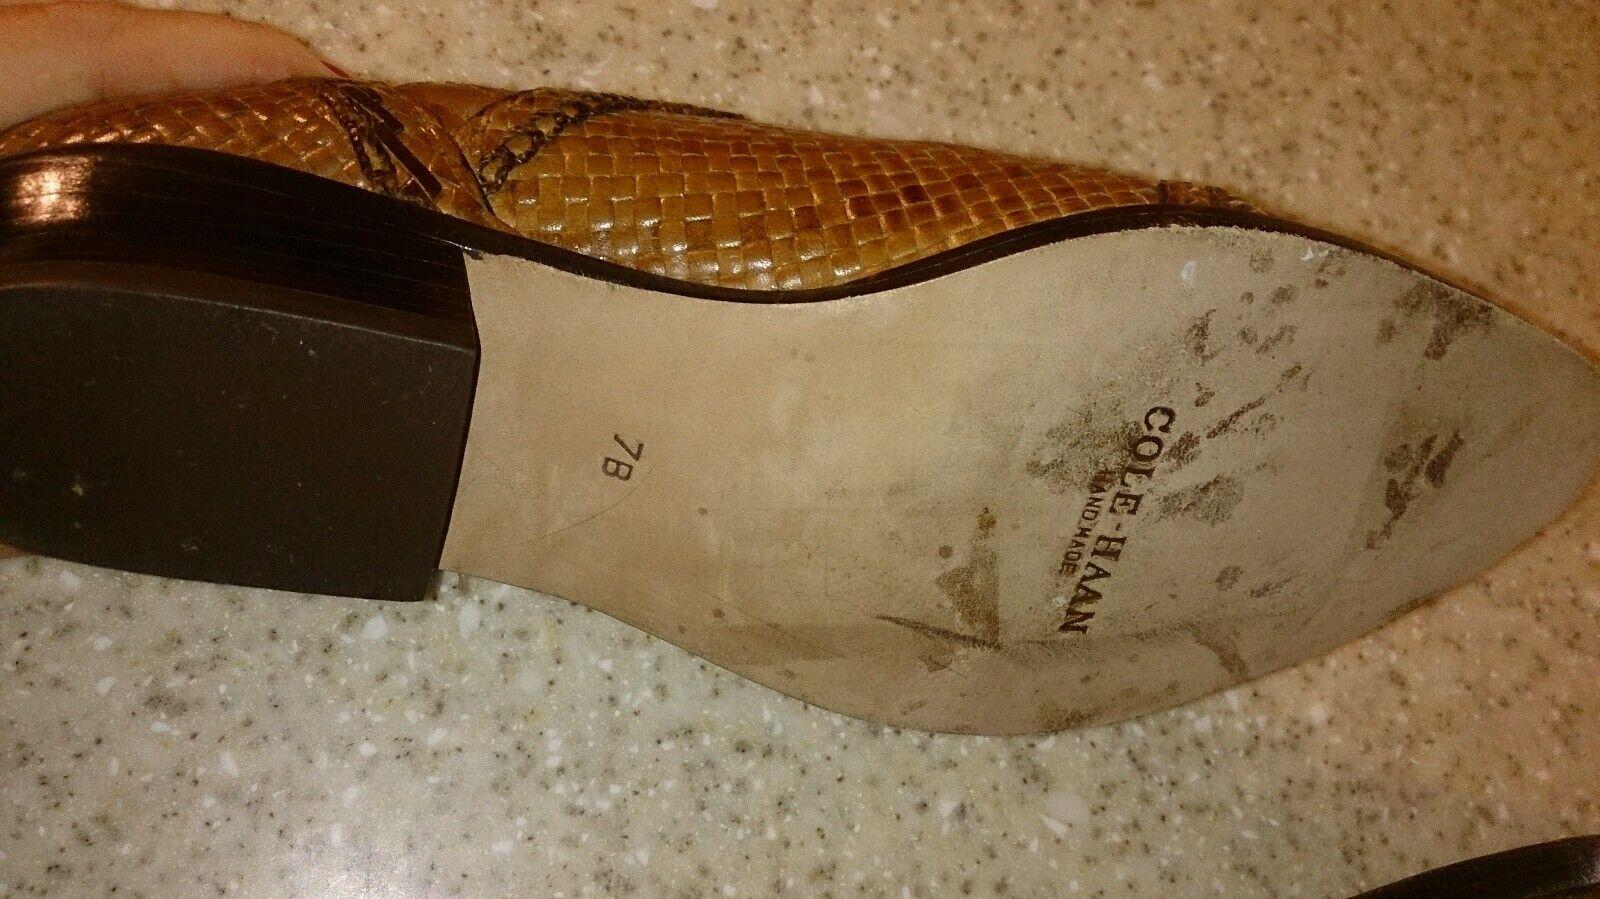 New Cole-Haan Mariel Brandy Woven Leather 7 B Like Like Like 6.5 B 1fb5c5